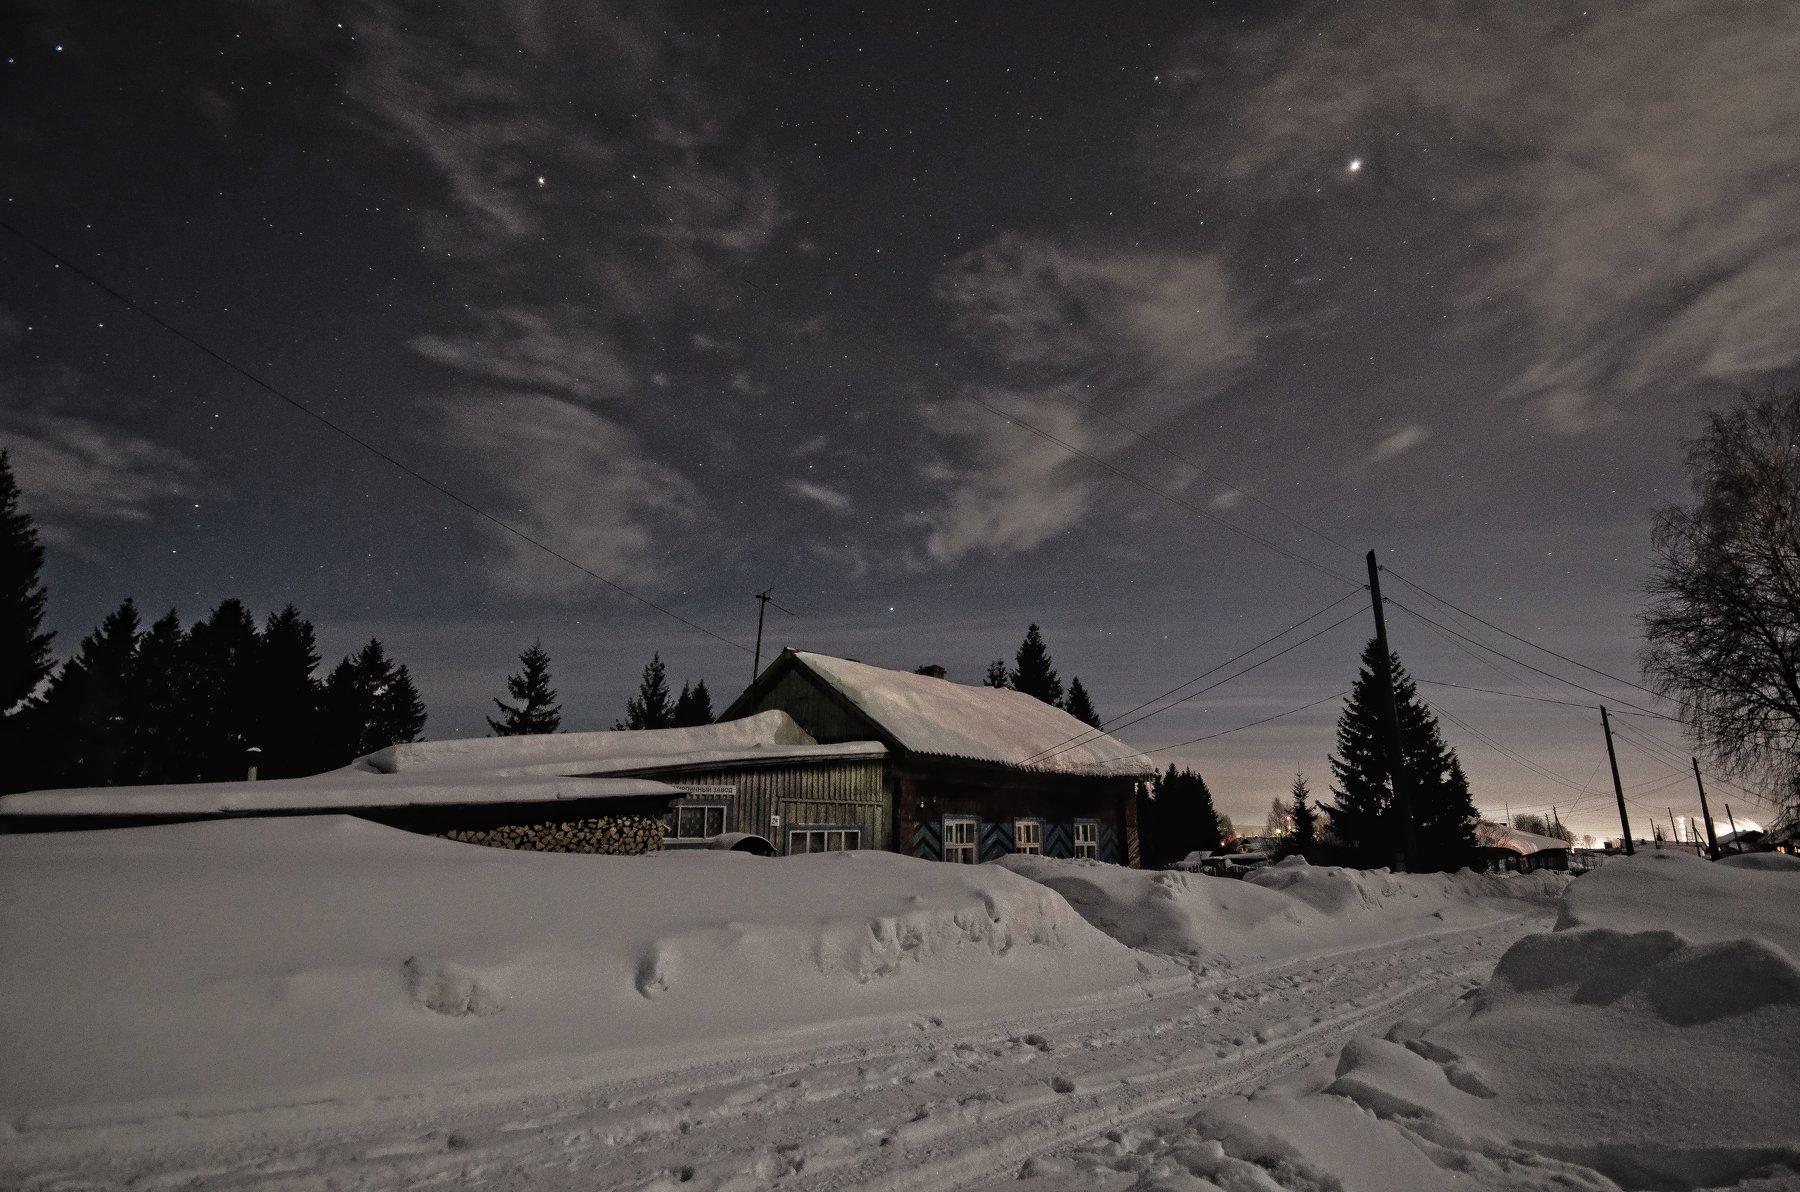 ночь,звезды,небо,провинция, Карепанов Евгений